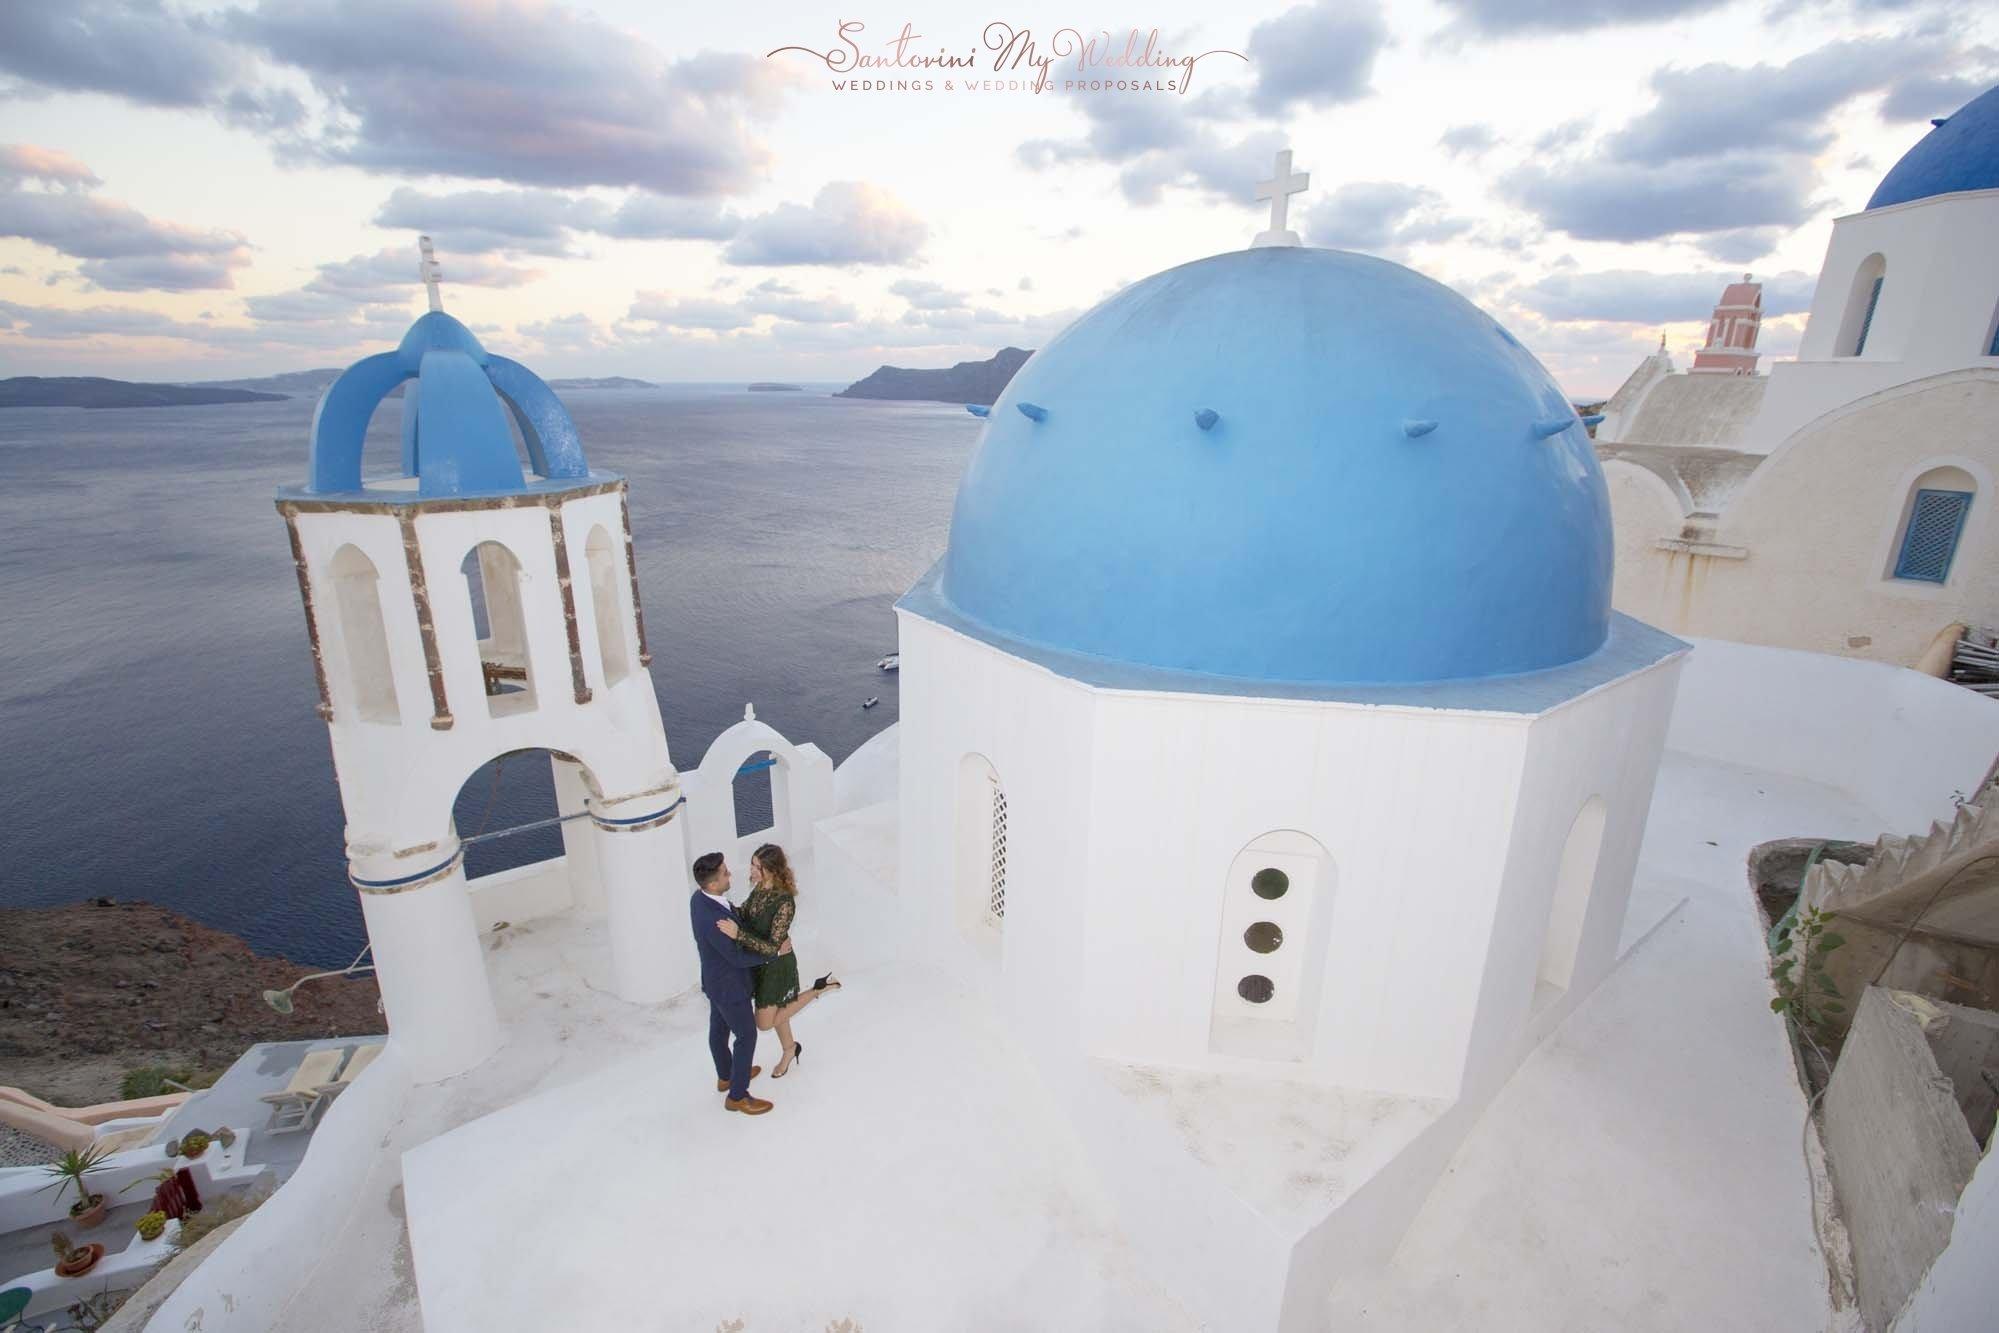 Blue Domes Proposal 1